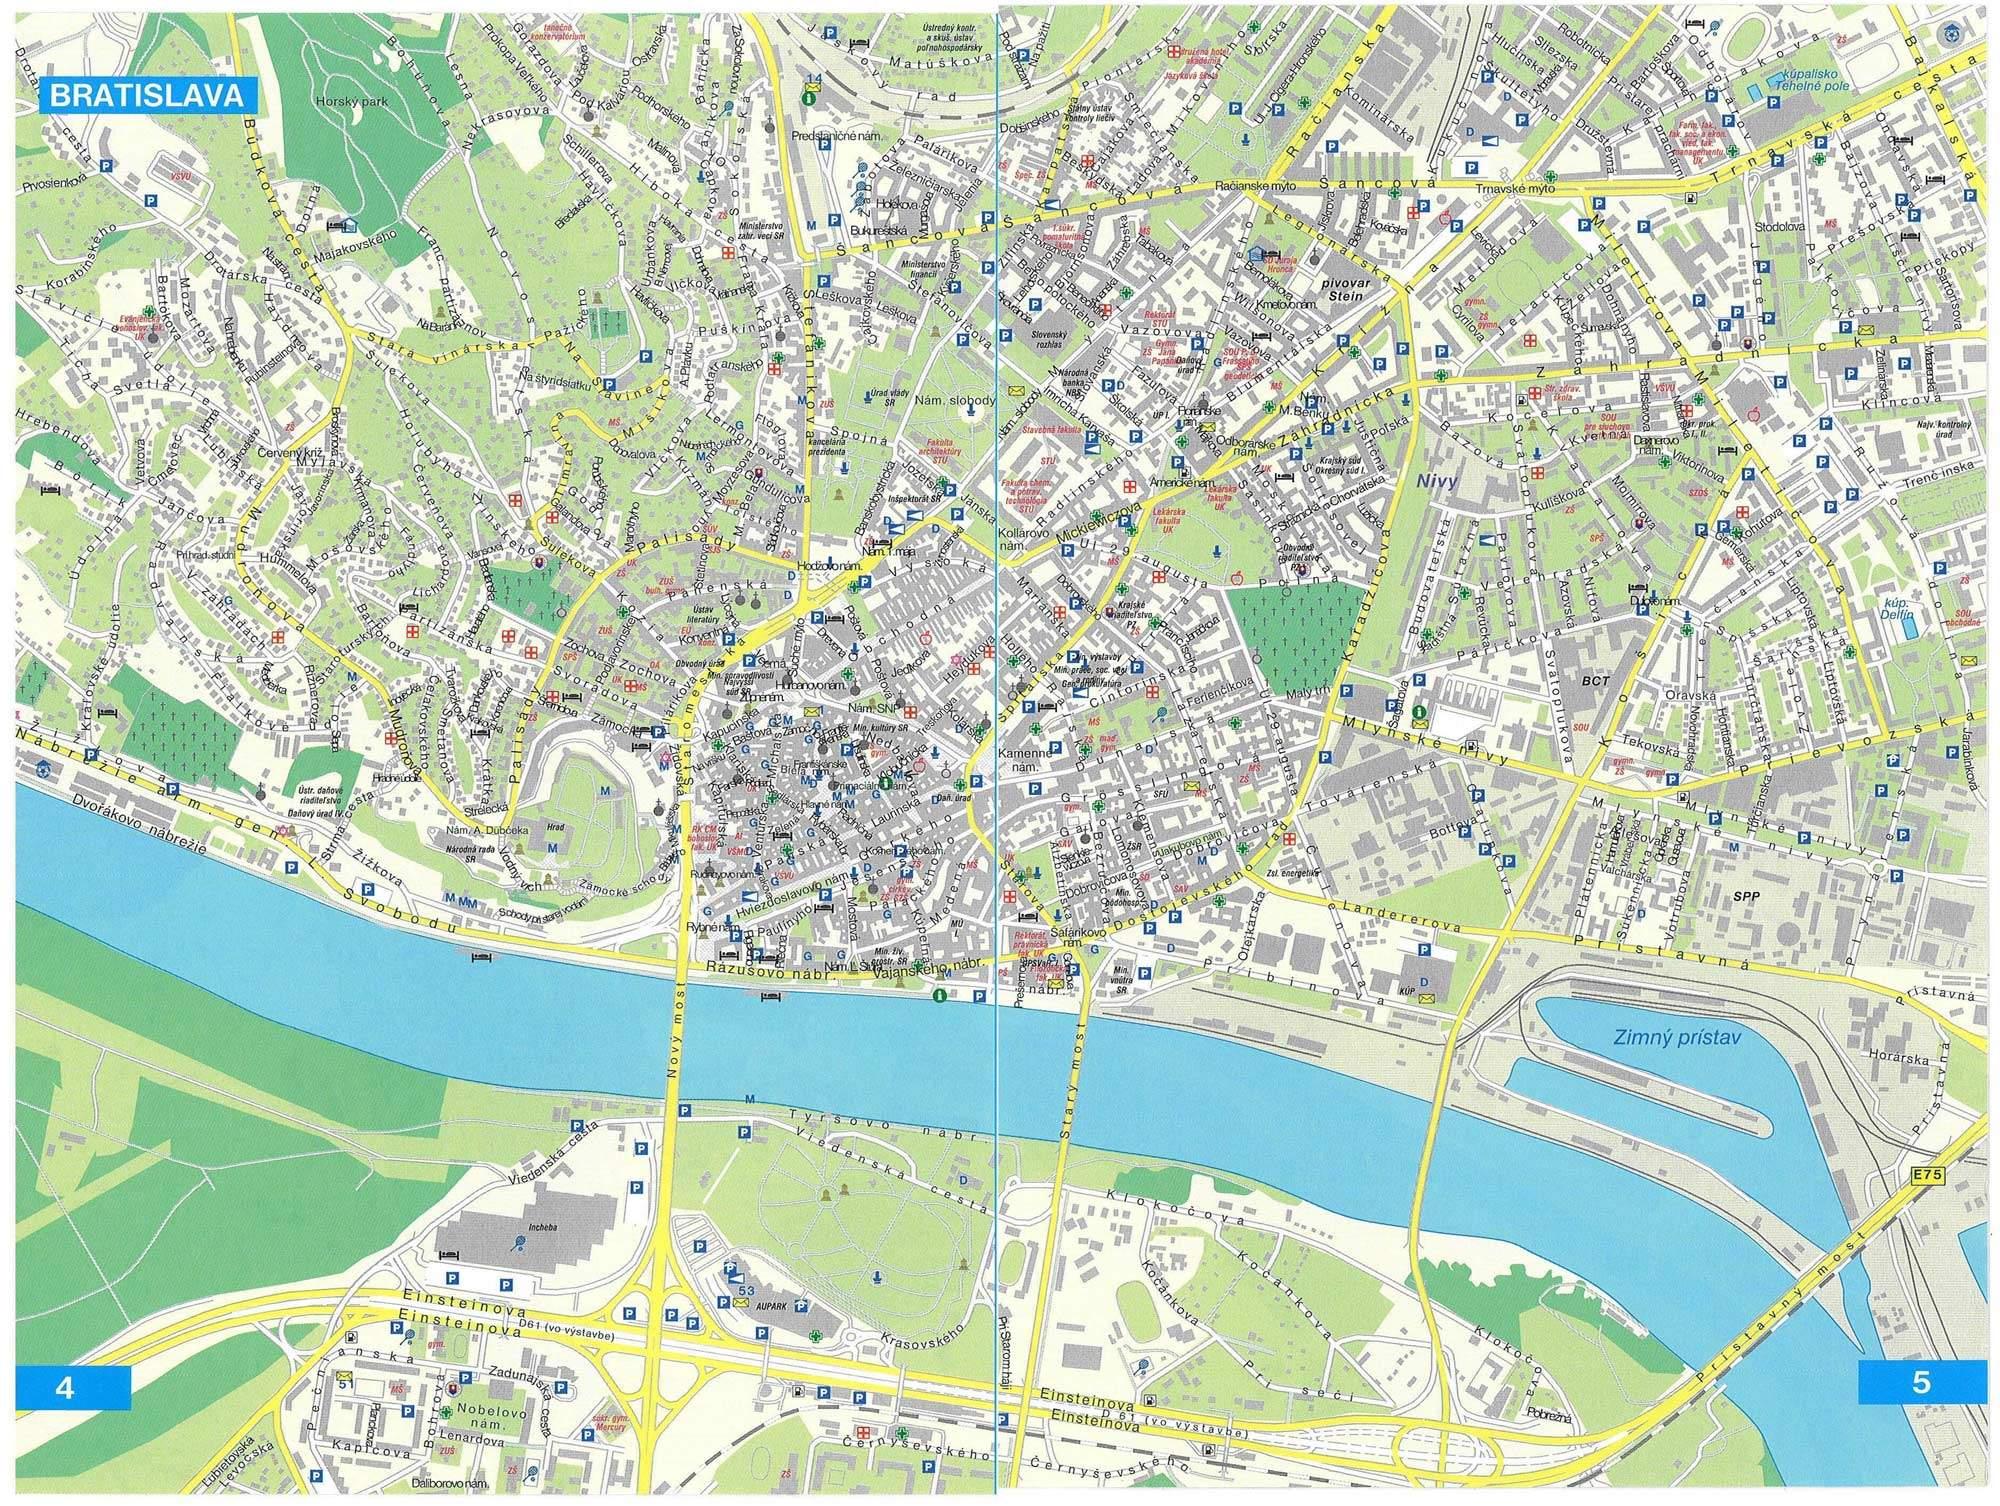 bratislava mapa Large Bratislava Maps for Free Download and Print | High  bratislava mapa